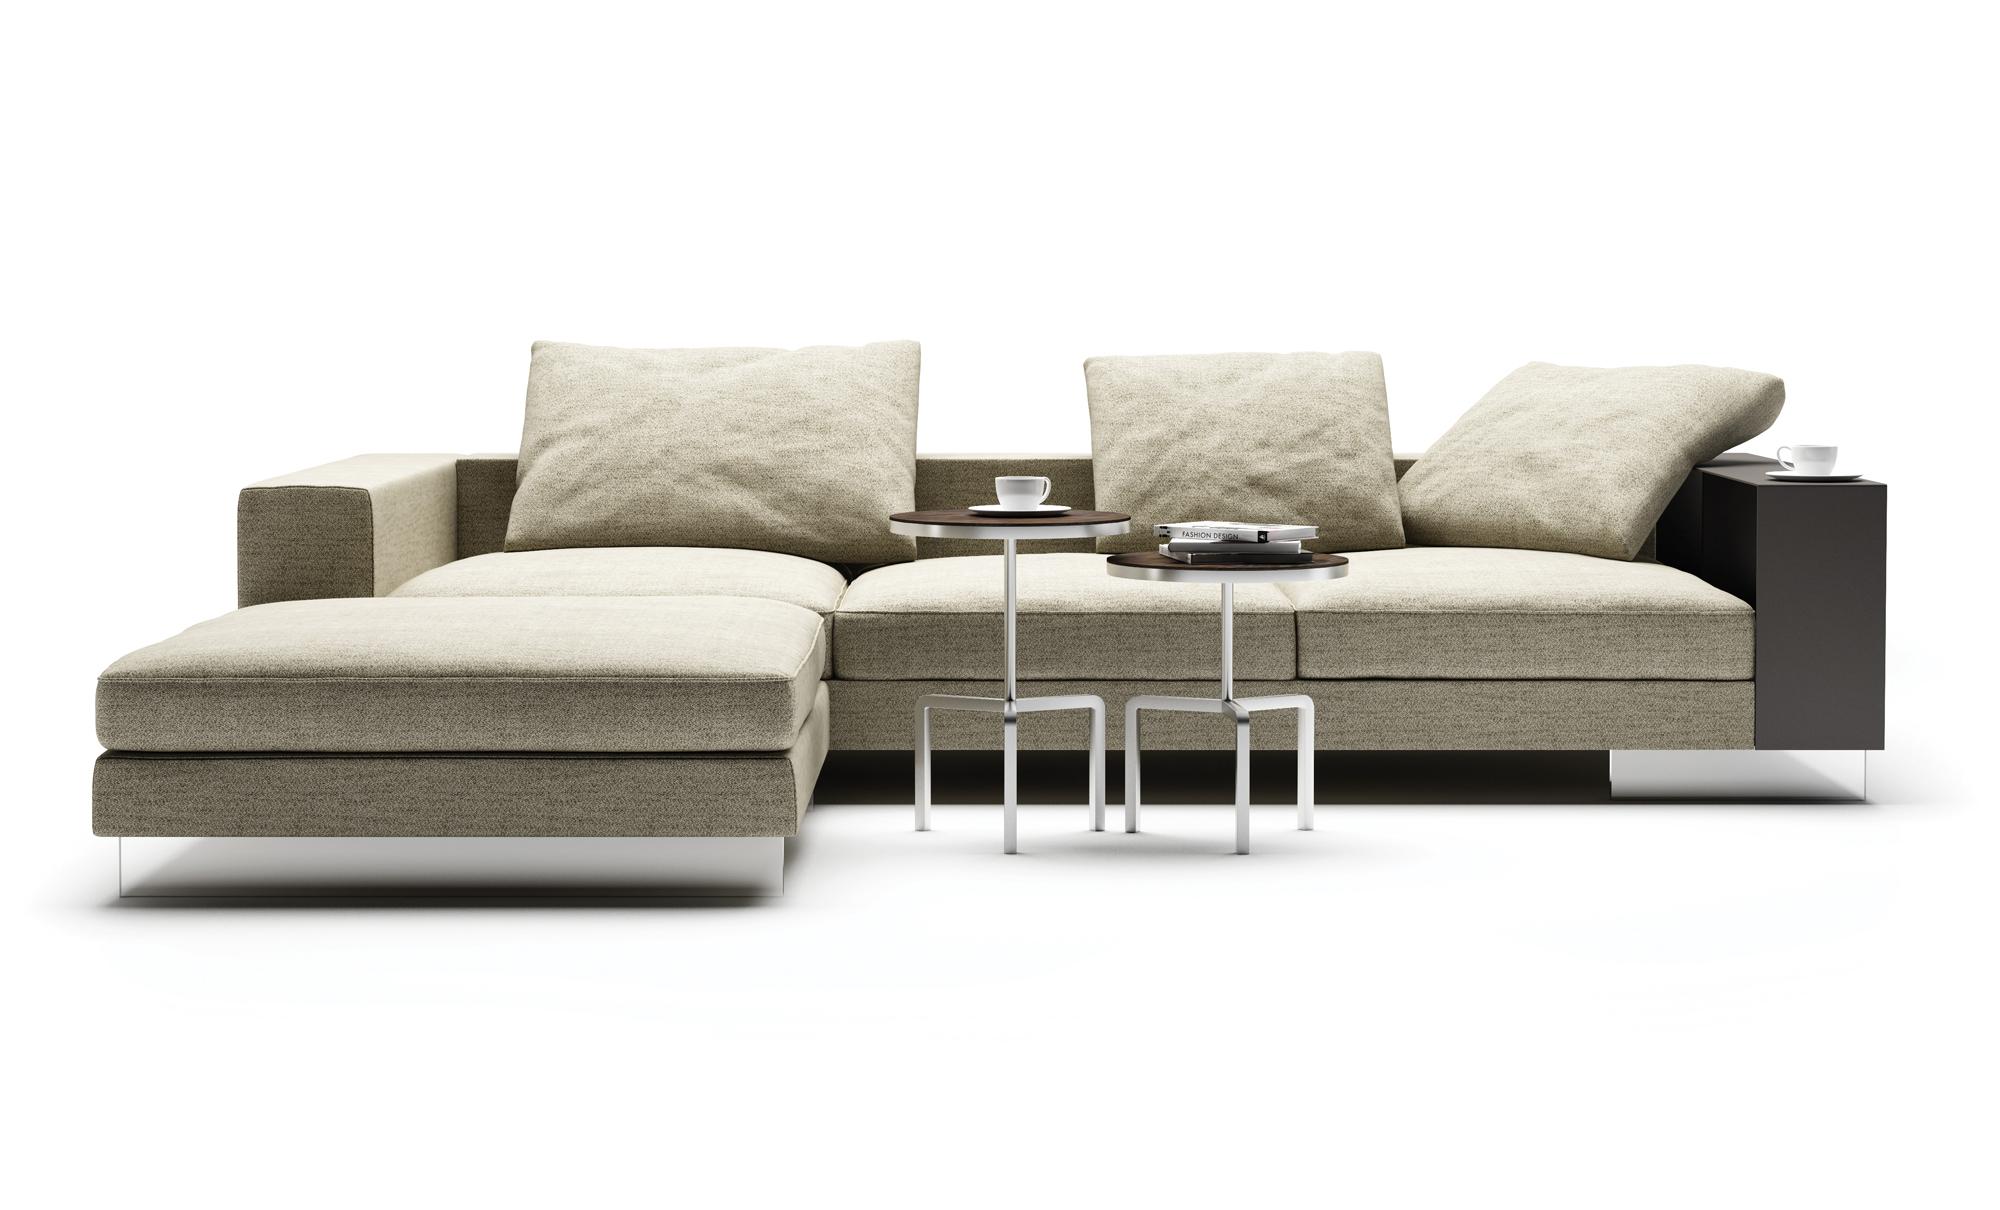 modular lounge with sofa bed adelaide cushion foam chennai best sofas melbourne brokeasshome